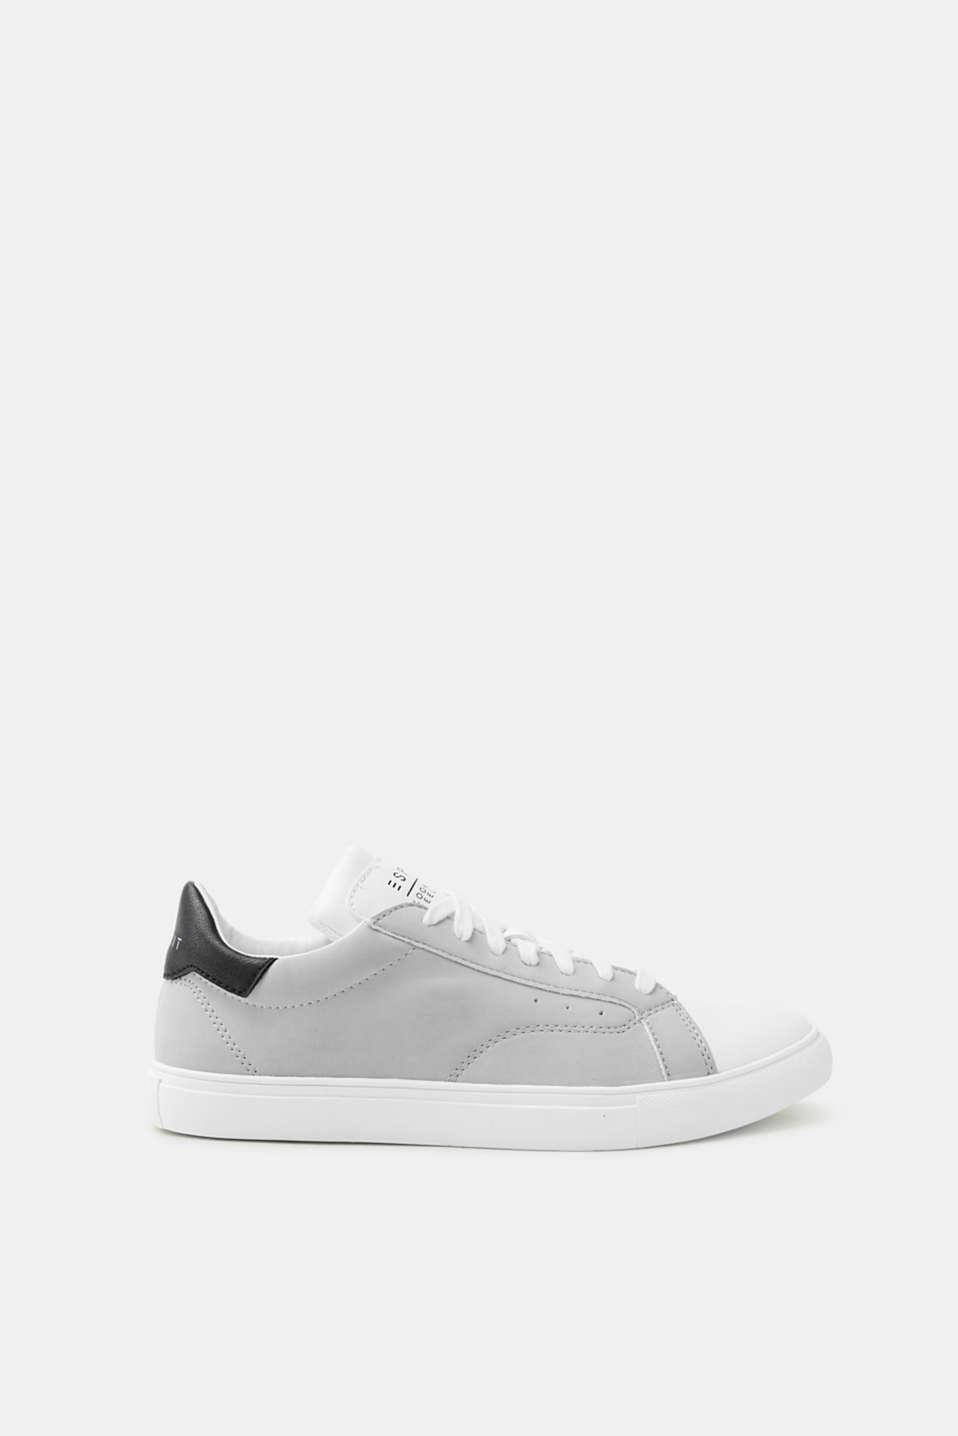 Esprit Retro-Sneaker in Leder-Optik für Damen, Größe 38, Medium Grey